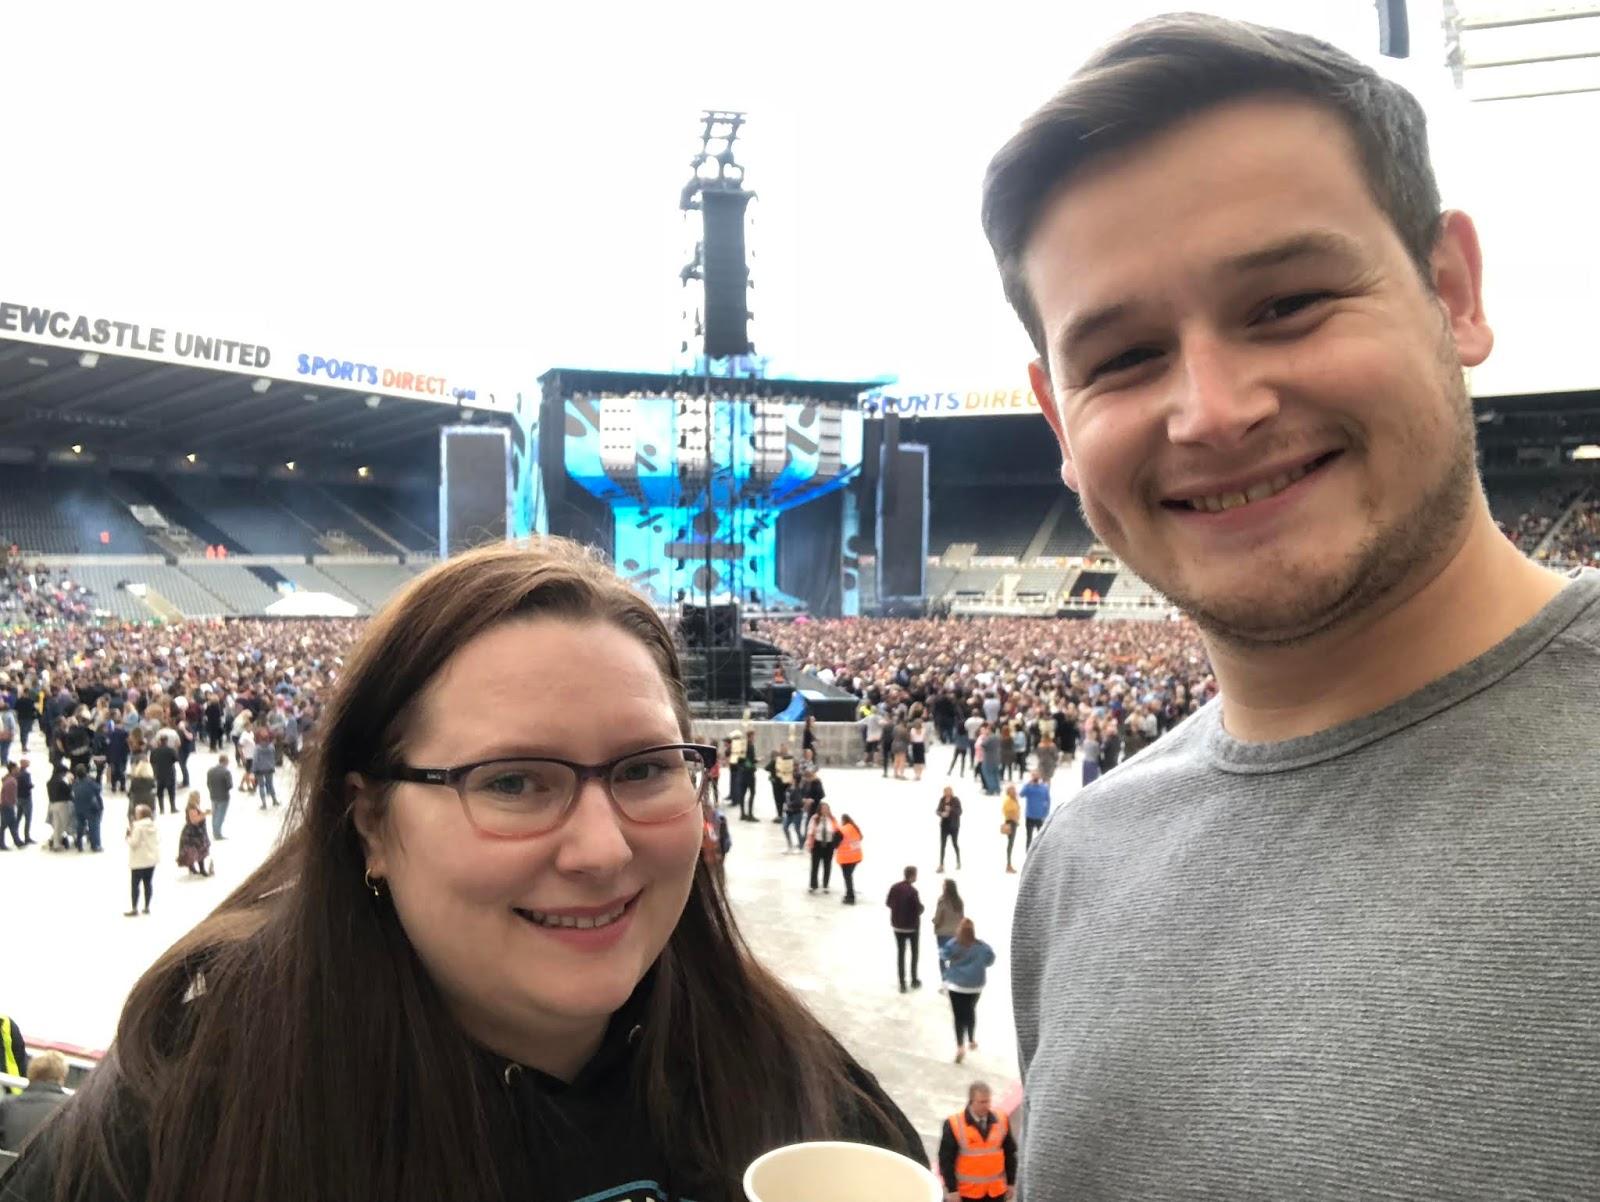 Ed Sheeran, Newcastle, St James Park, Live, Concert